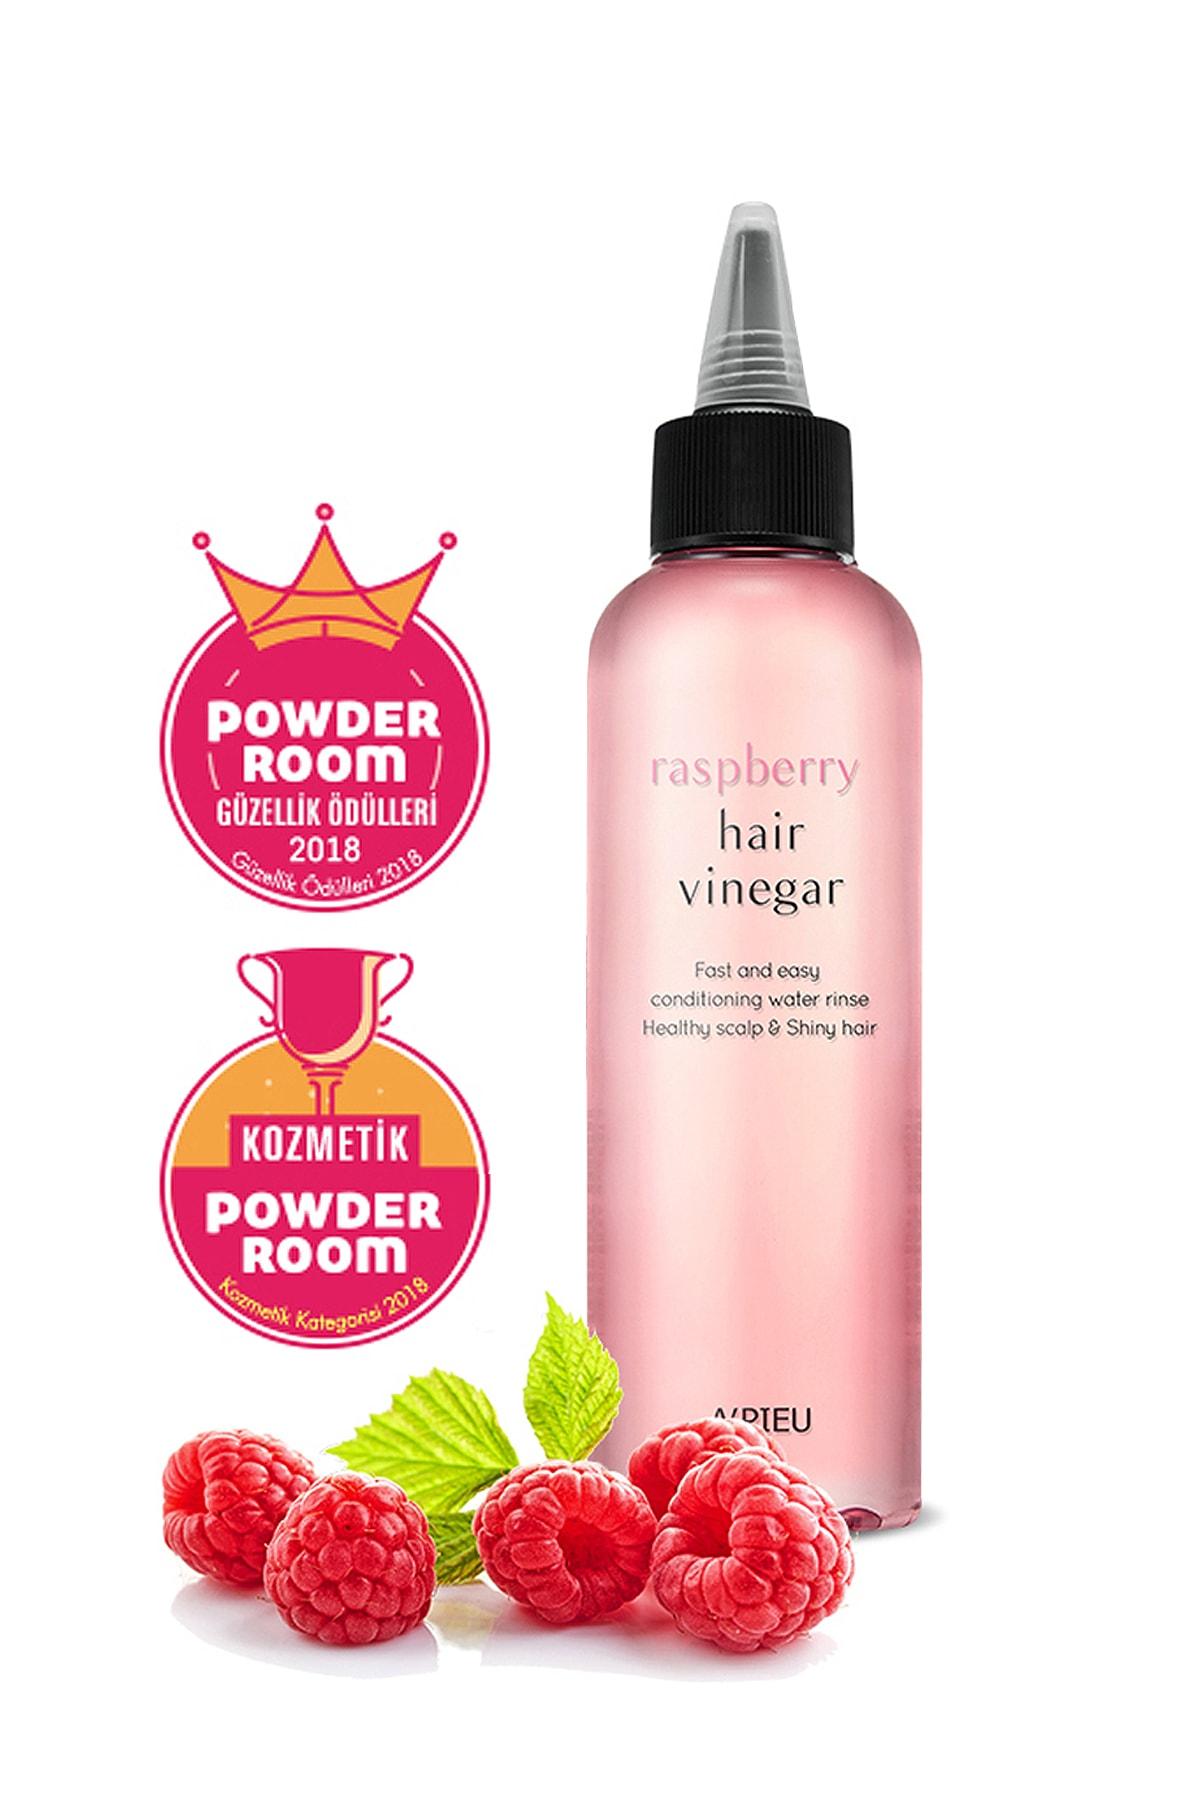 Missha Saçlara Parlaklık Veren Ahududu Saç Sirkesi 200ml APieu Raspberry Hair Vinegar